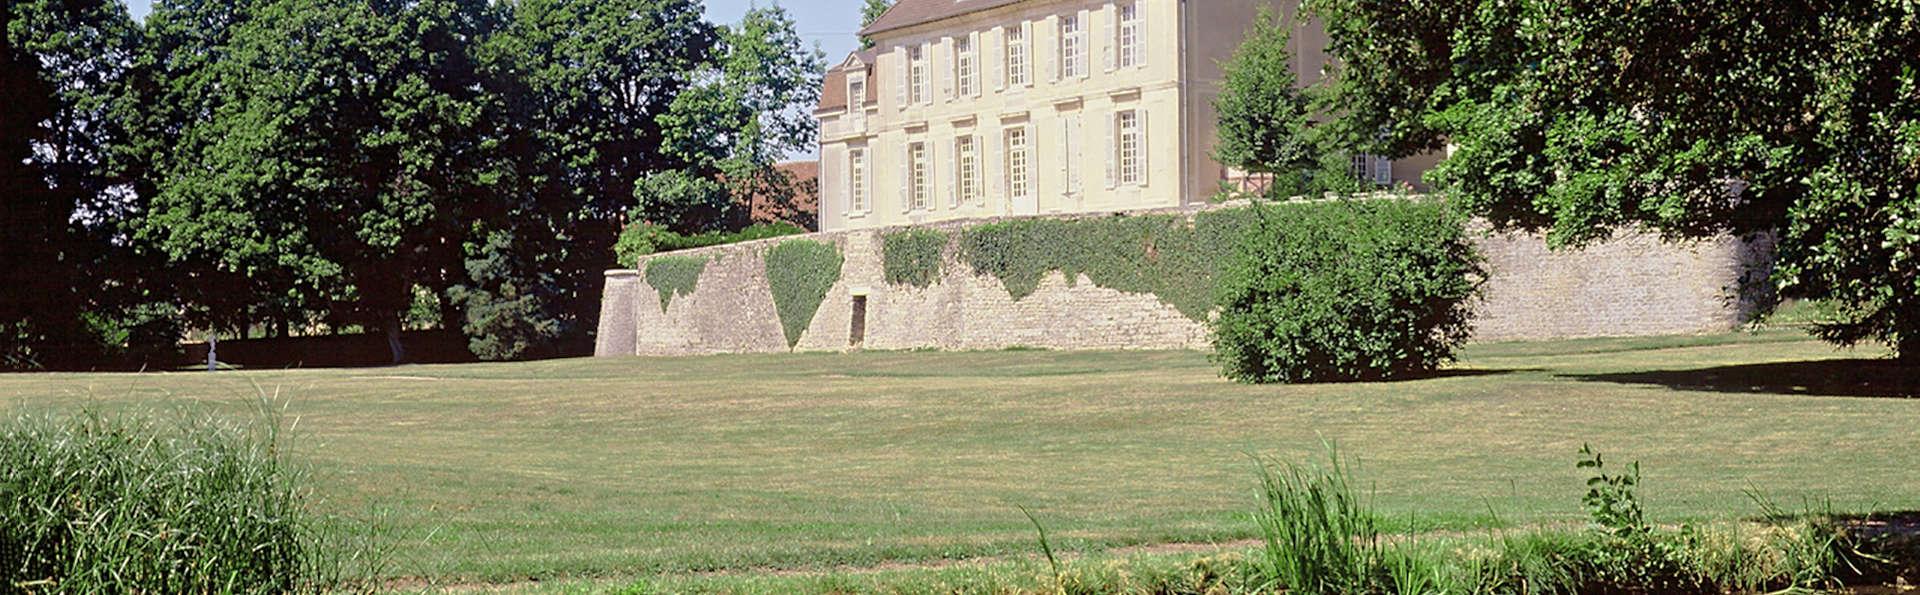 Château de Rigny  - EDIT_Fachada_2.jpg